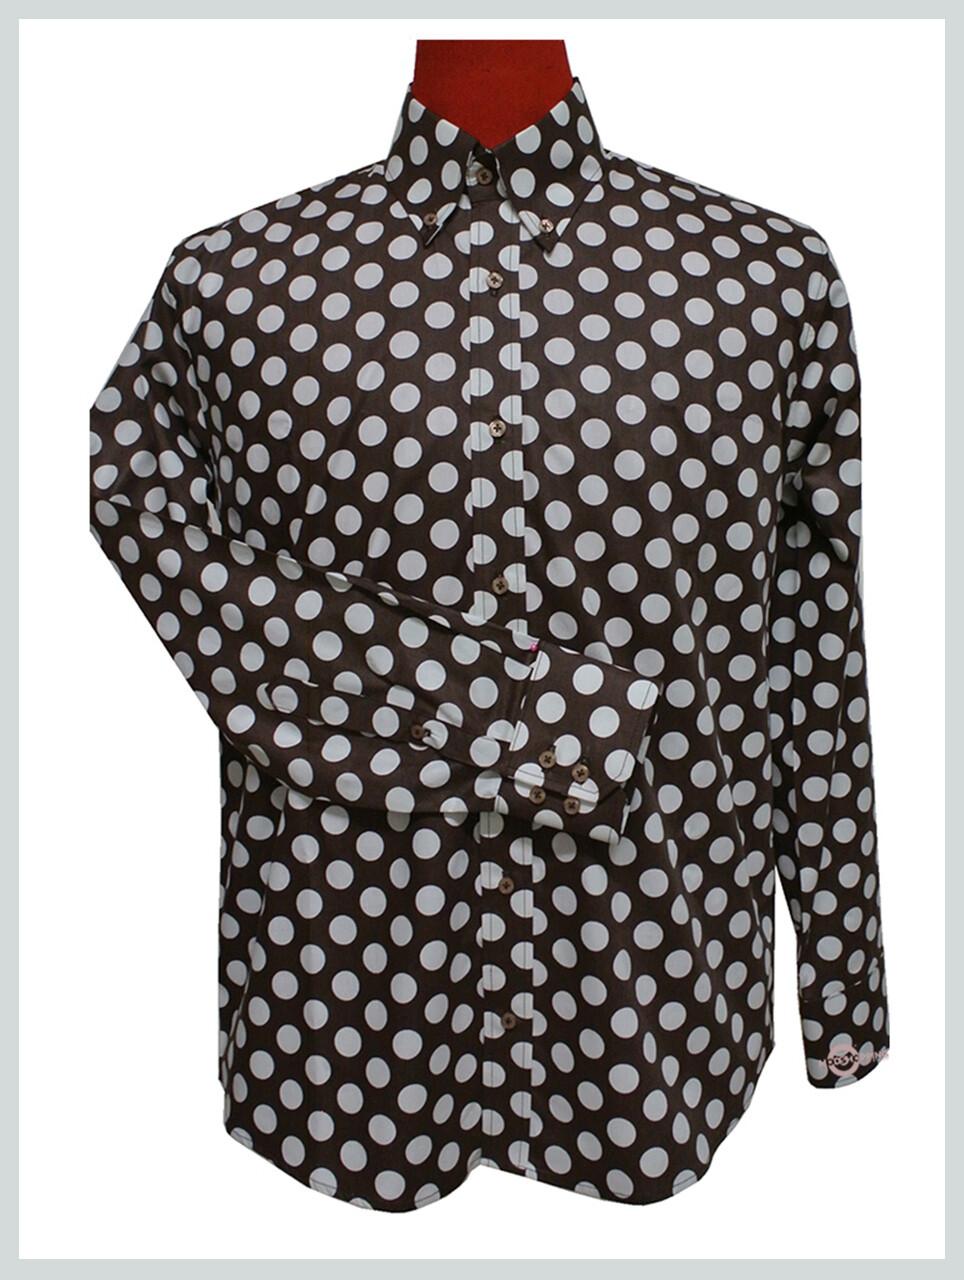 Polka Dot Shirt| Mens Big White Dot Brown Polka Dot Shirt Uk